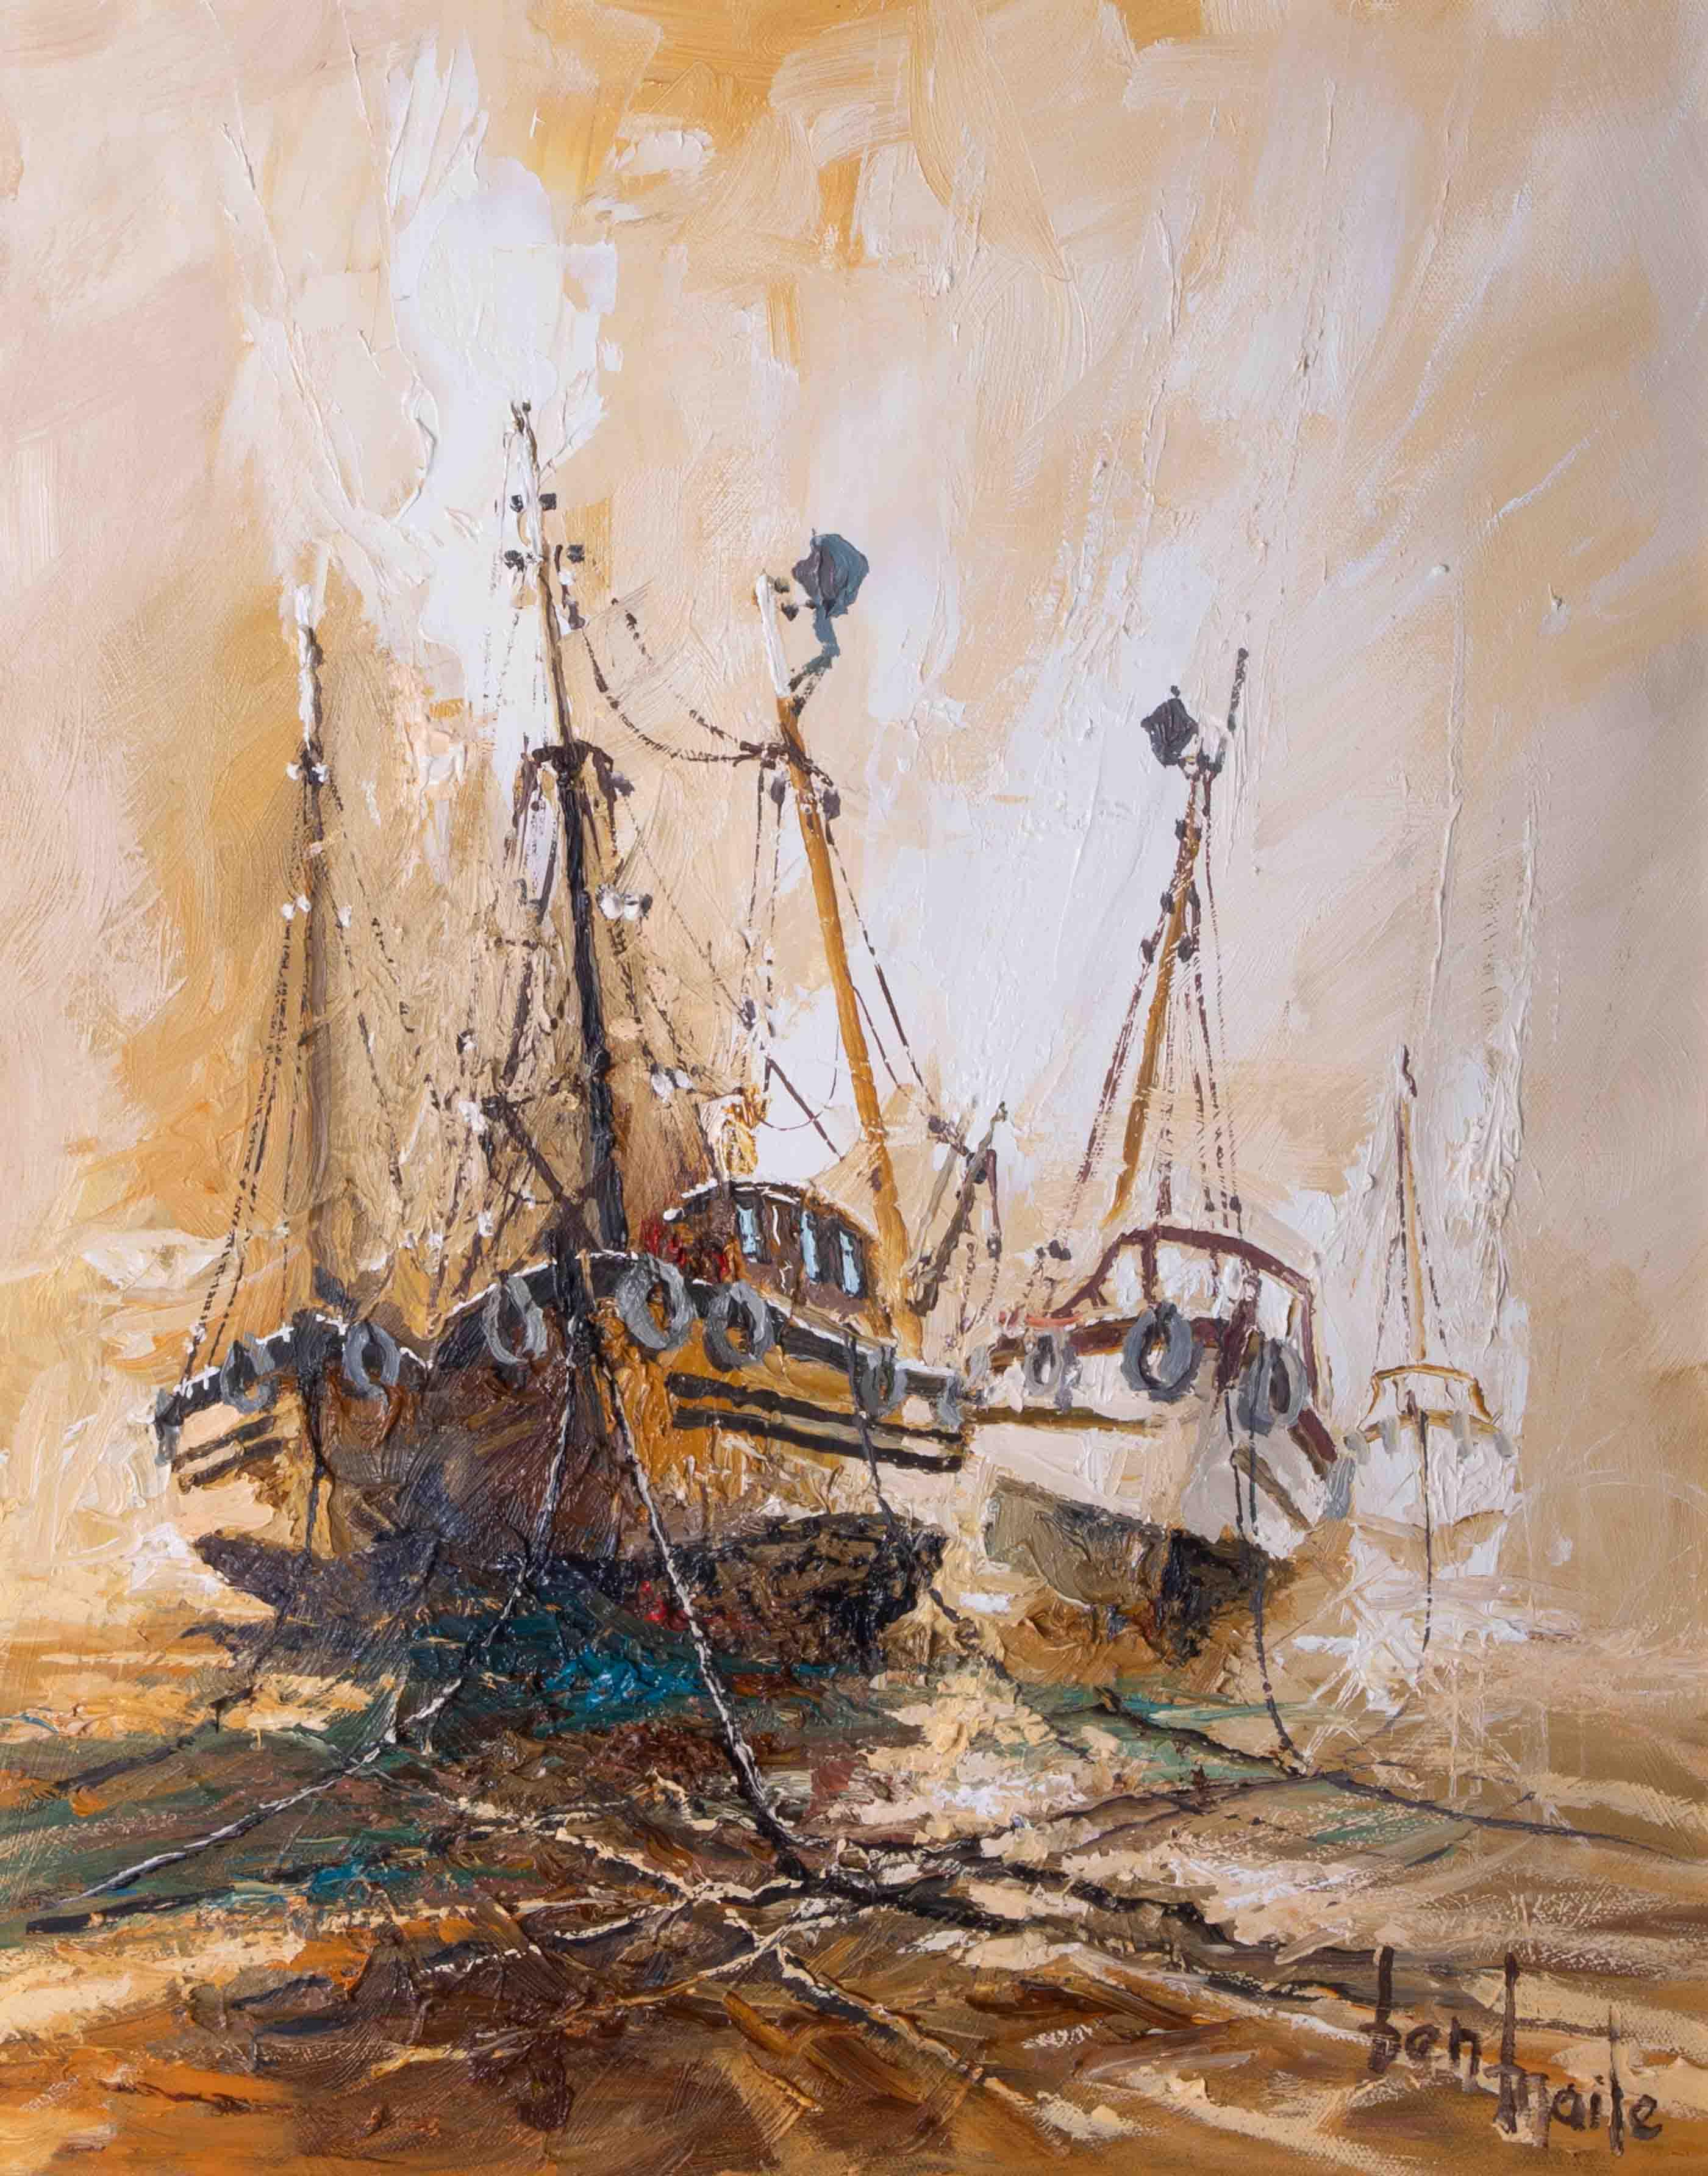 Ben Maile (1922-2017) 'Awaiting The Tide' oil on canvas, signed, 49cm x 38cm, framed. - Image 2 of 2